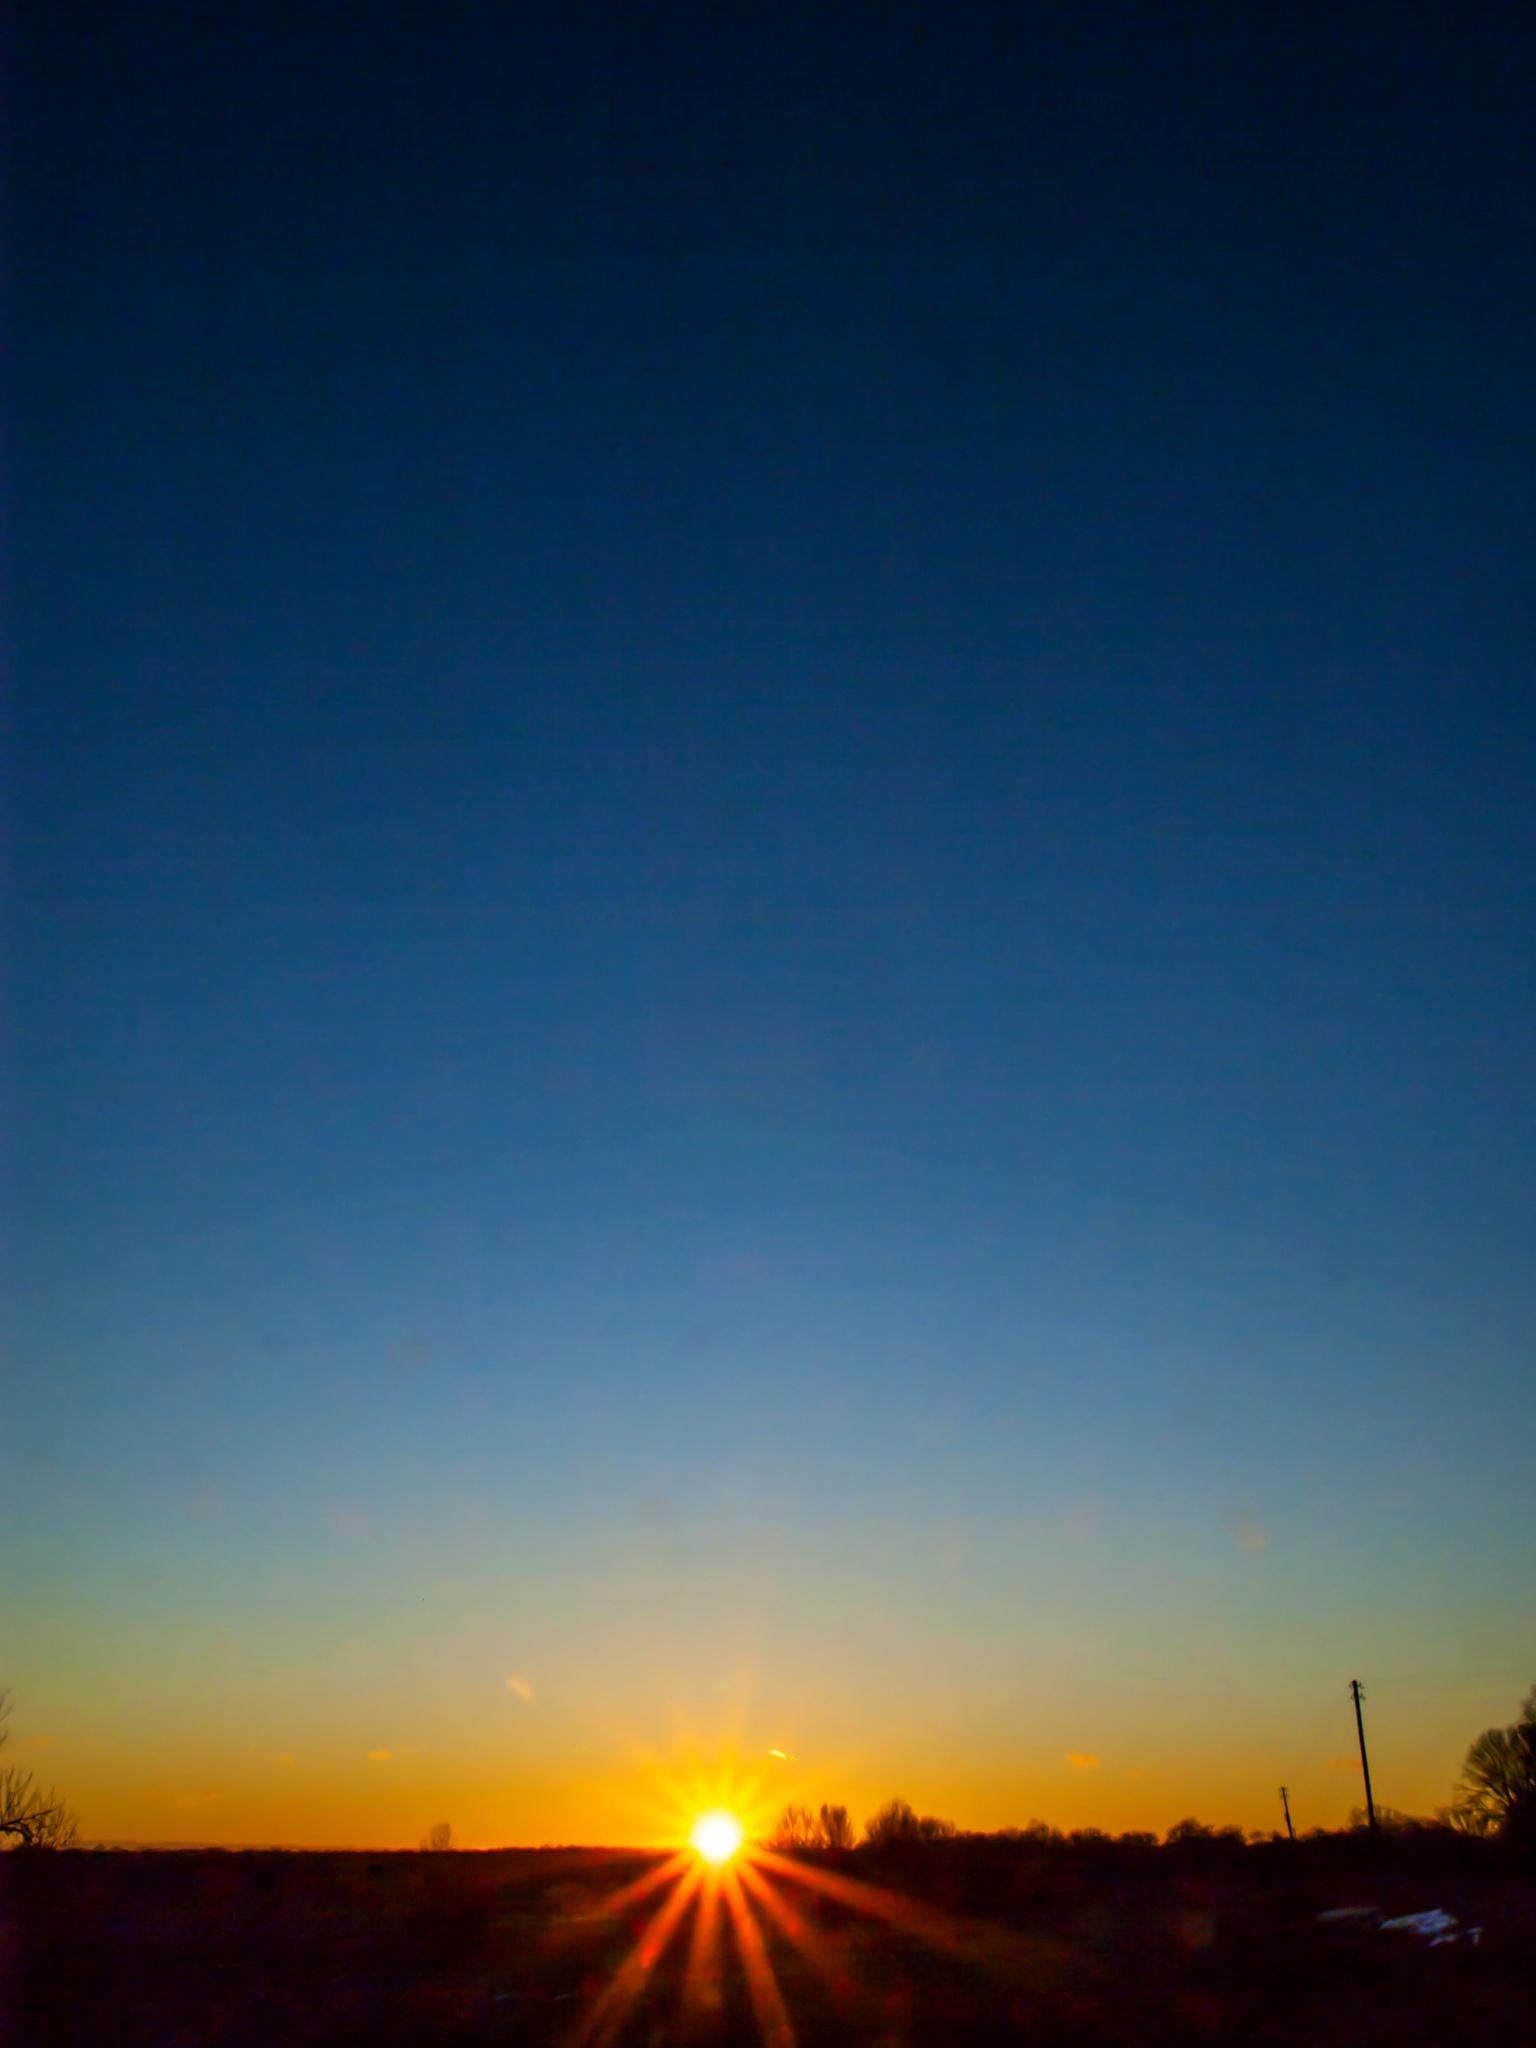 Sunset by Kenéz Imre